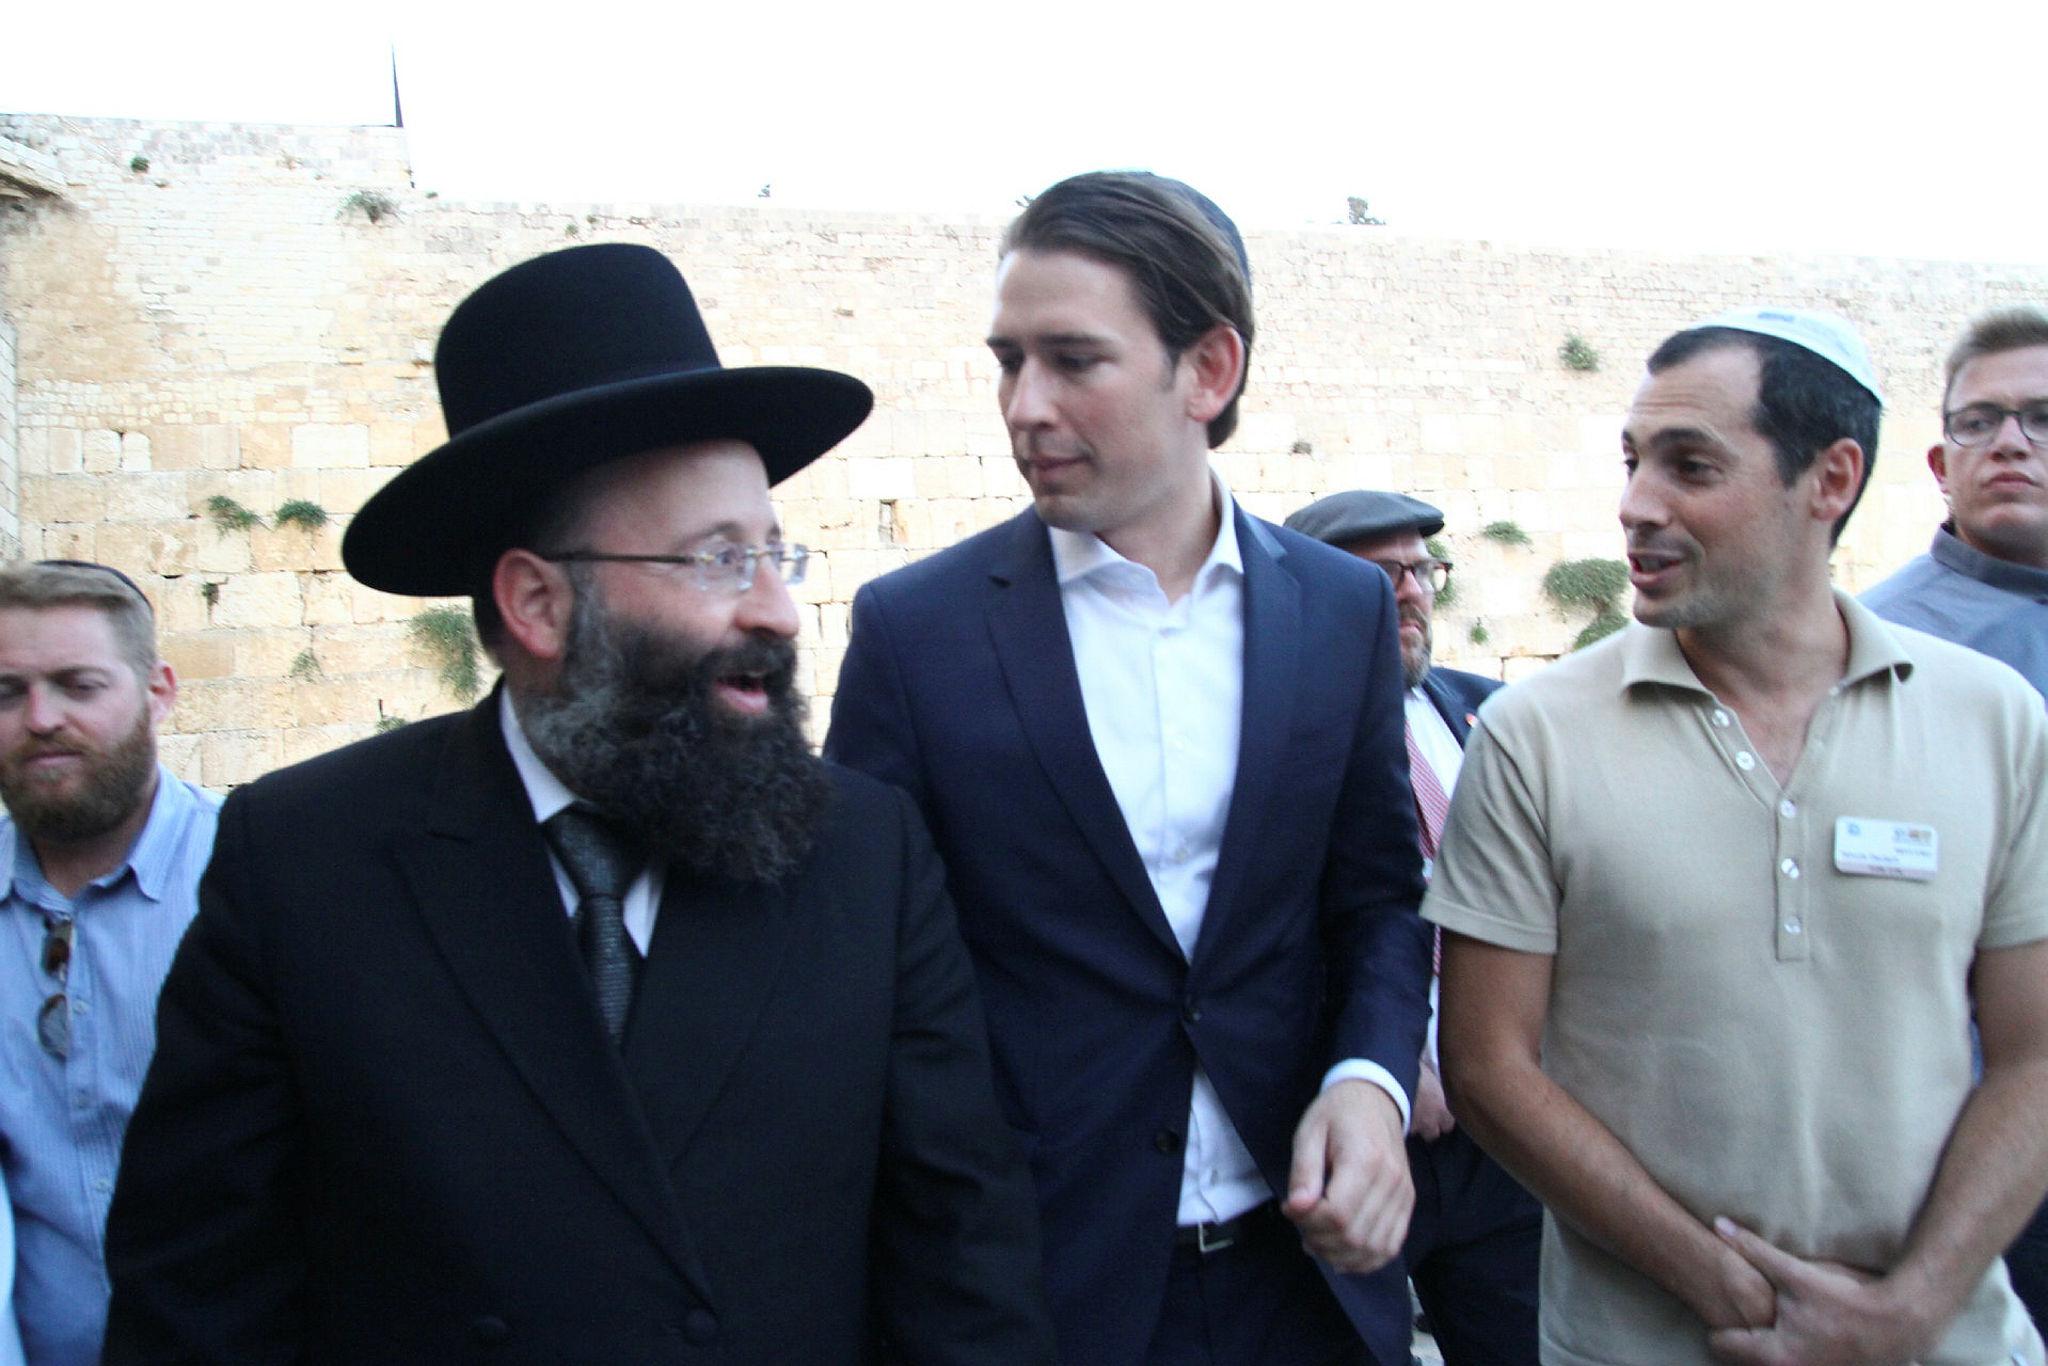 Sebastian Kurz, Austria's Chancellor, visiting the Western Wall